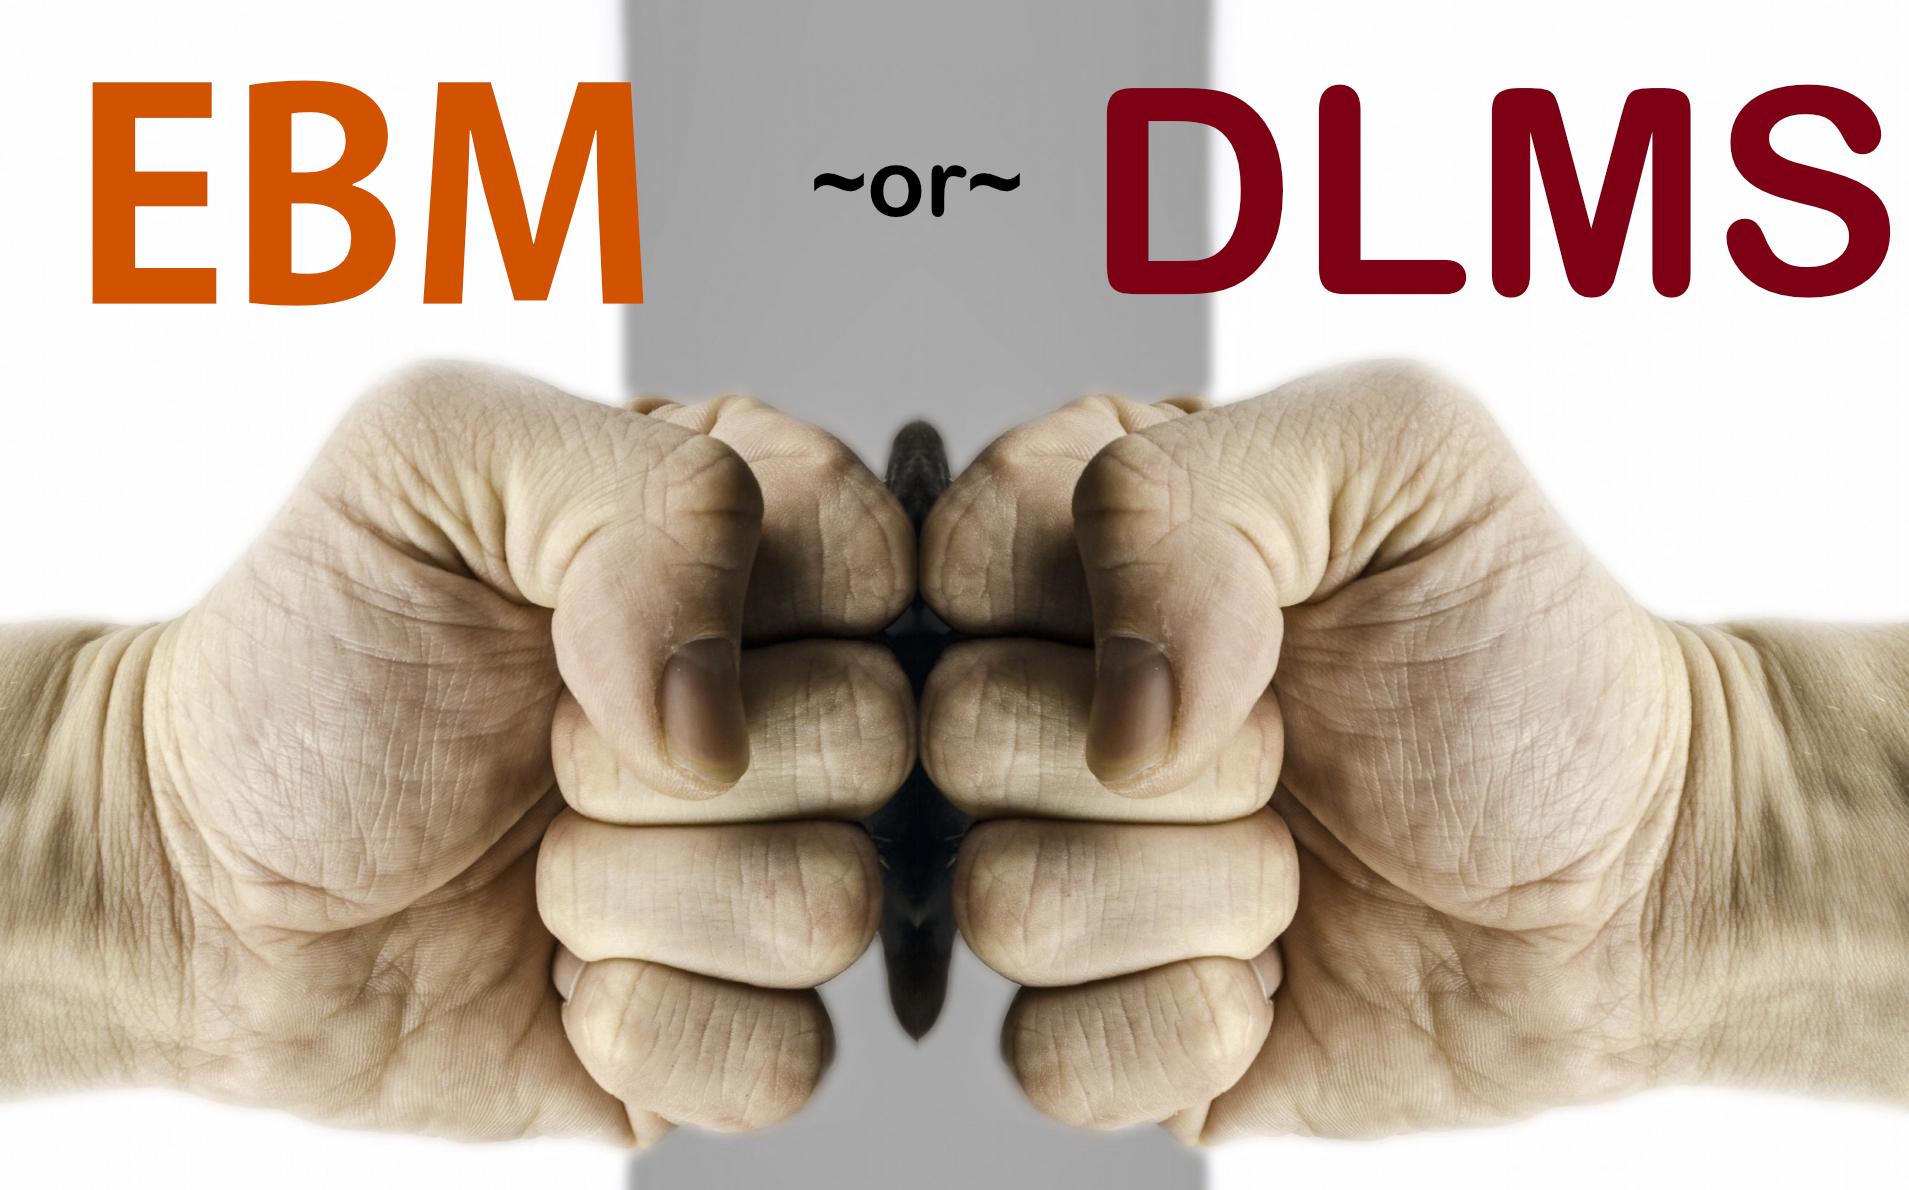 A Consideration of EBM versus DMLS Industrial Metal 3D Printing Processes, Part 1